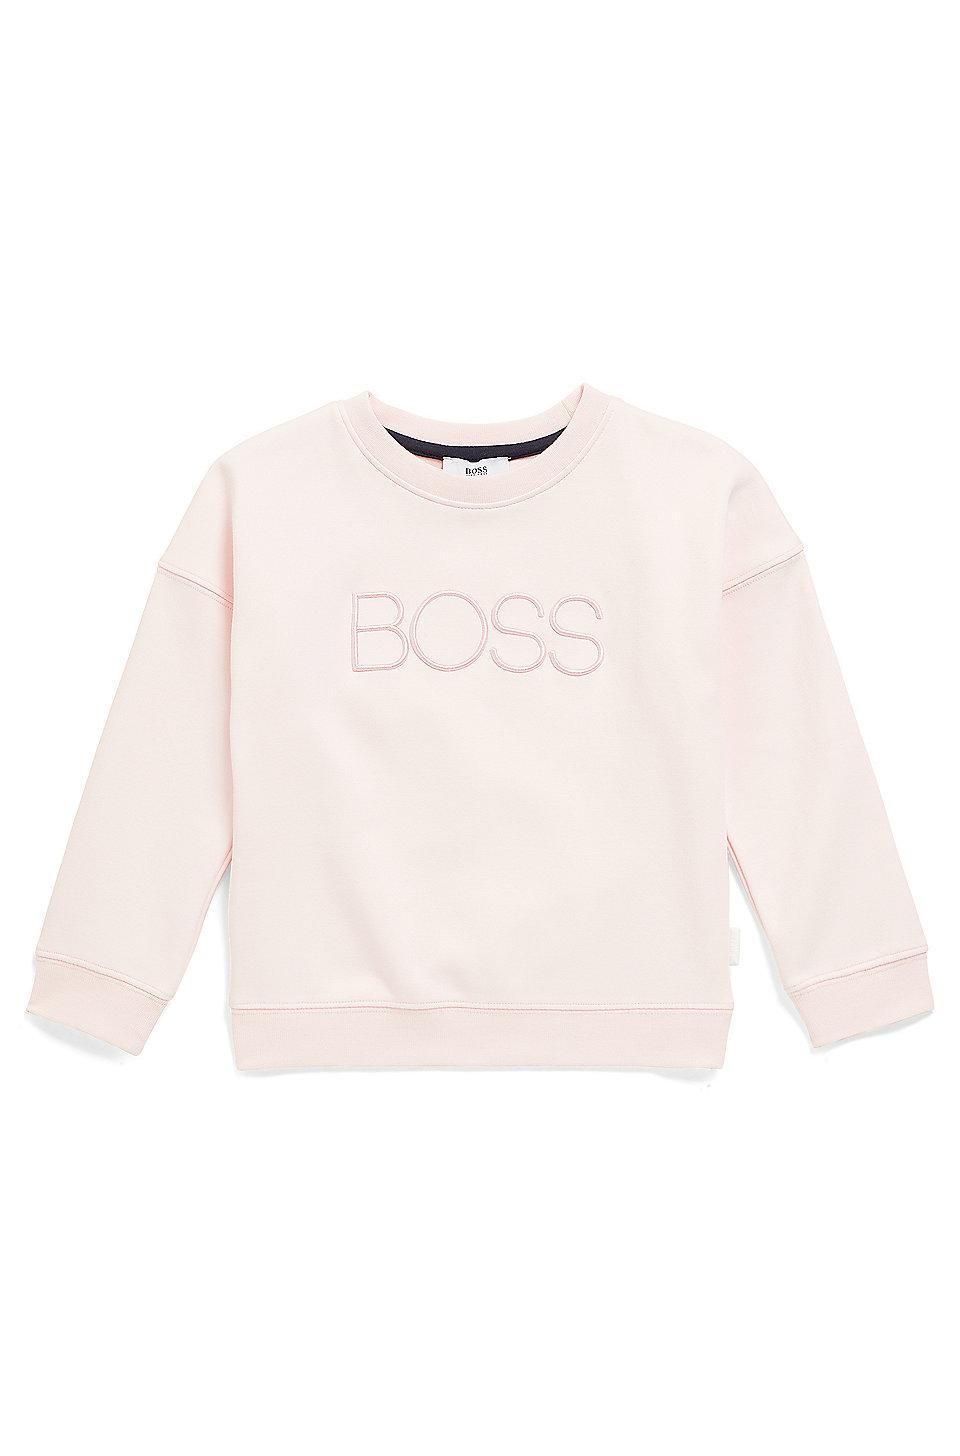 5b9117b30 BOSS - Kids' cotton-blend sweatshirt with logo embroidery